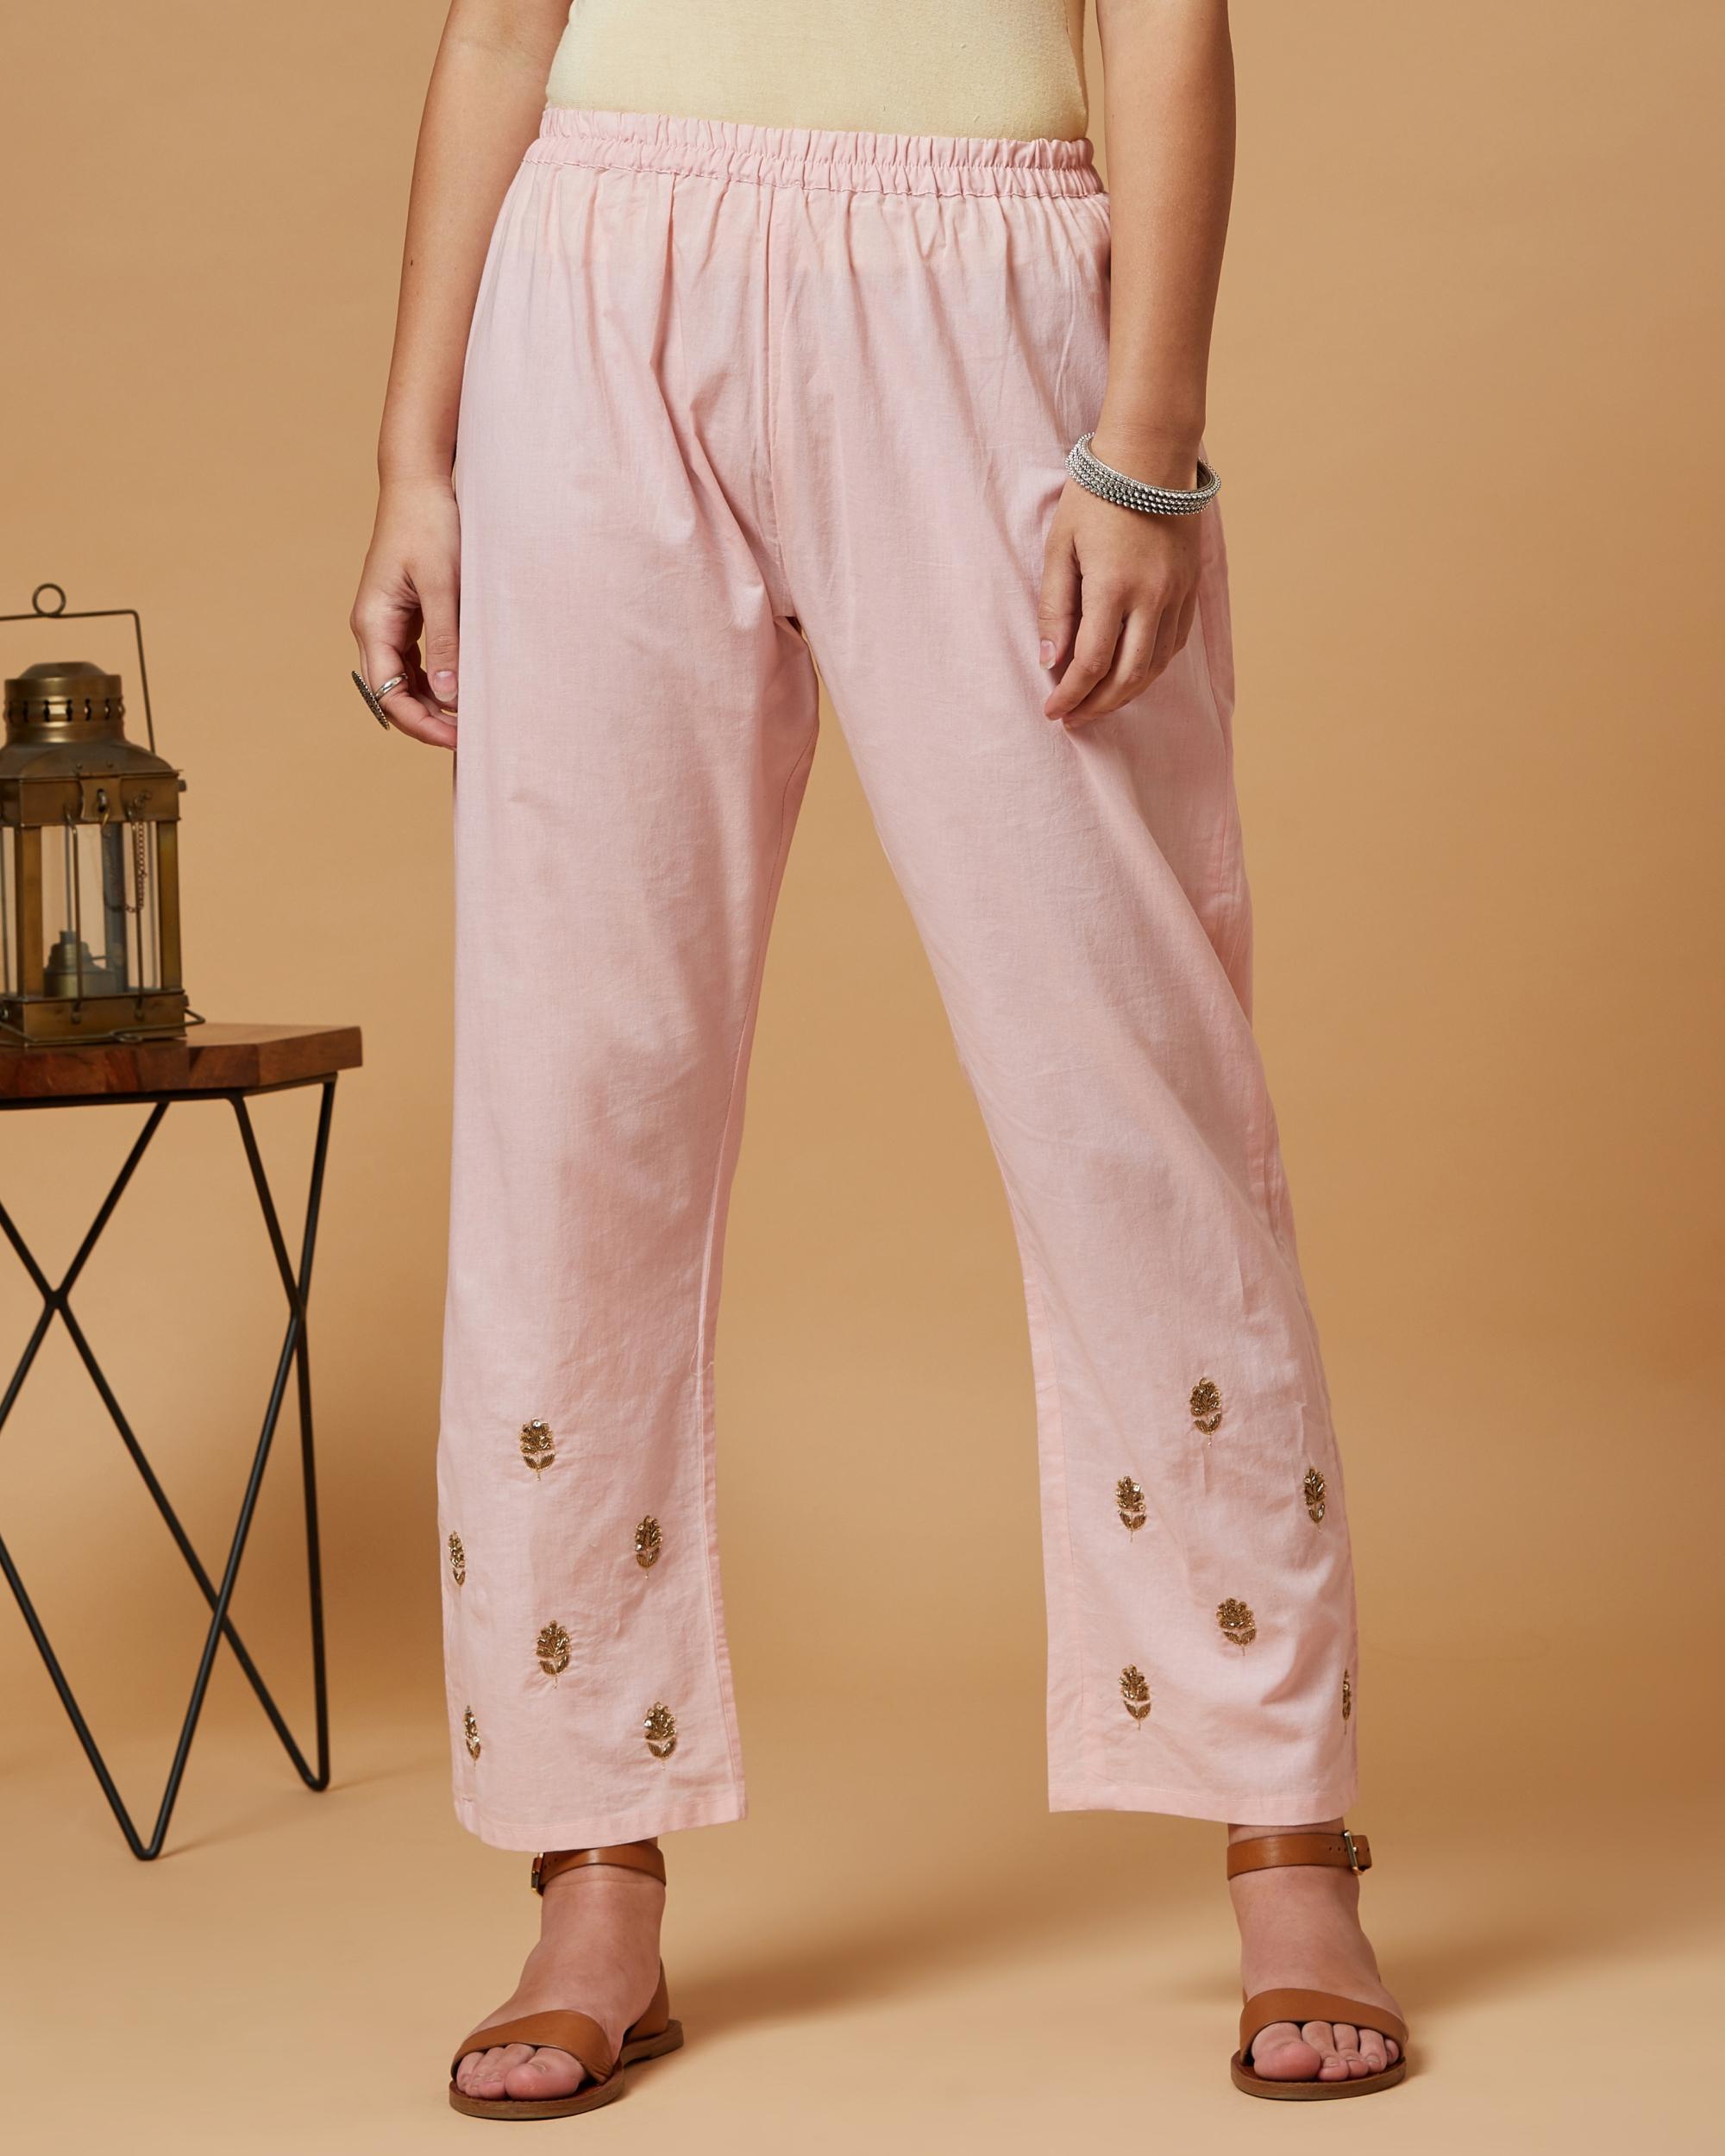 Pink floral boota pants